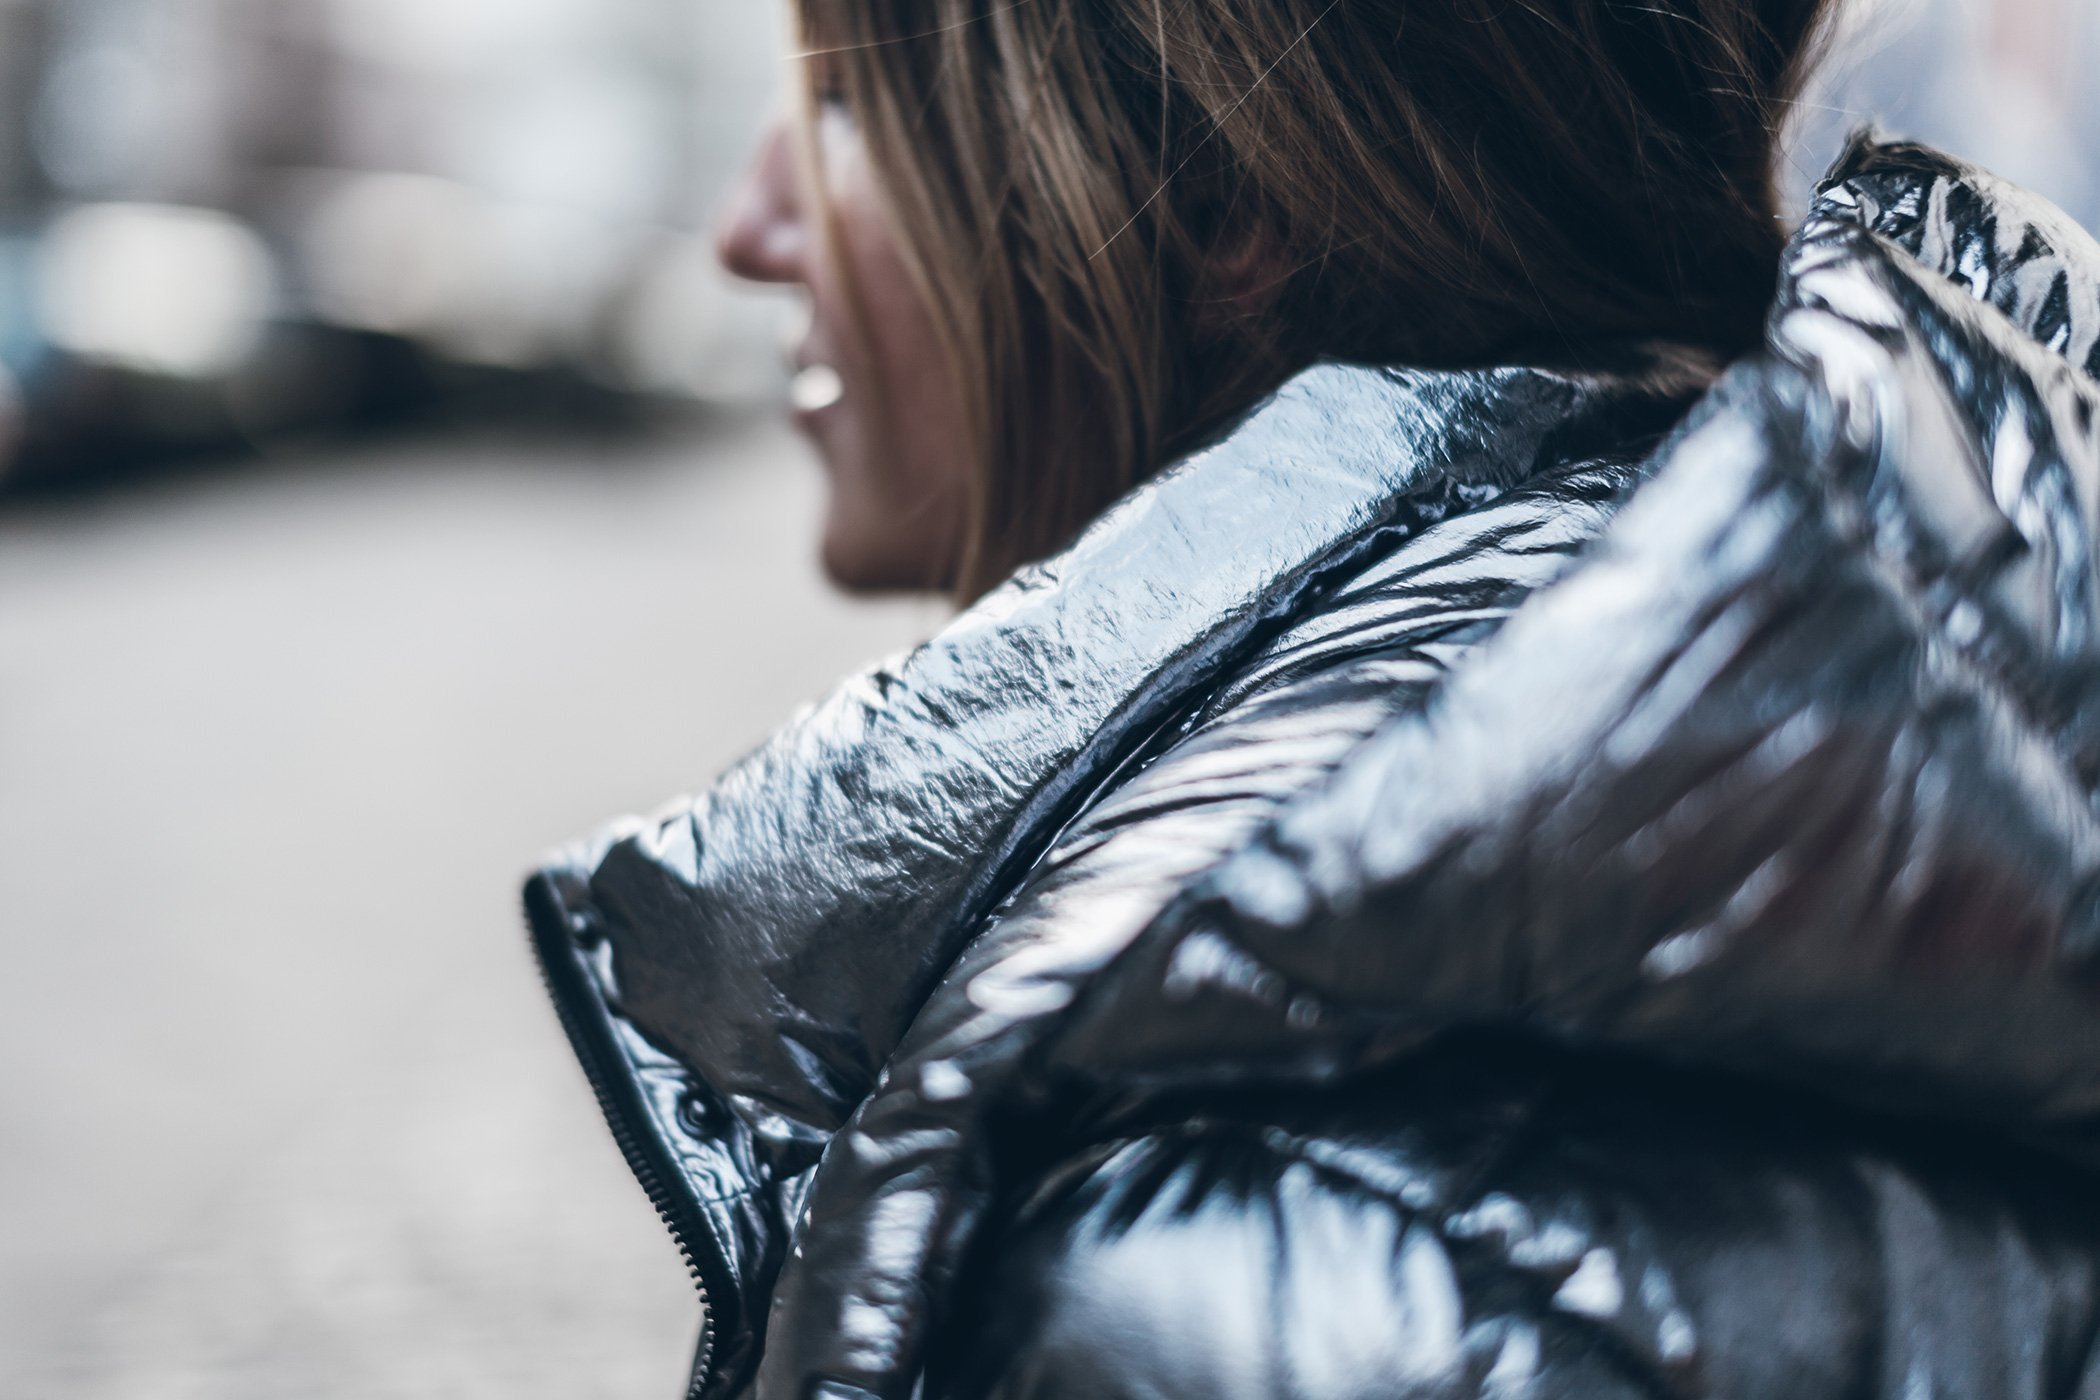 mikuta-silver-jacket-2